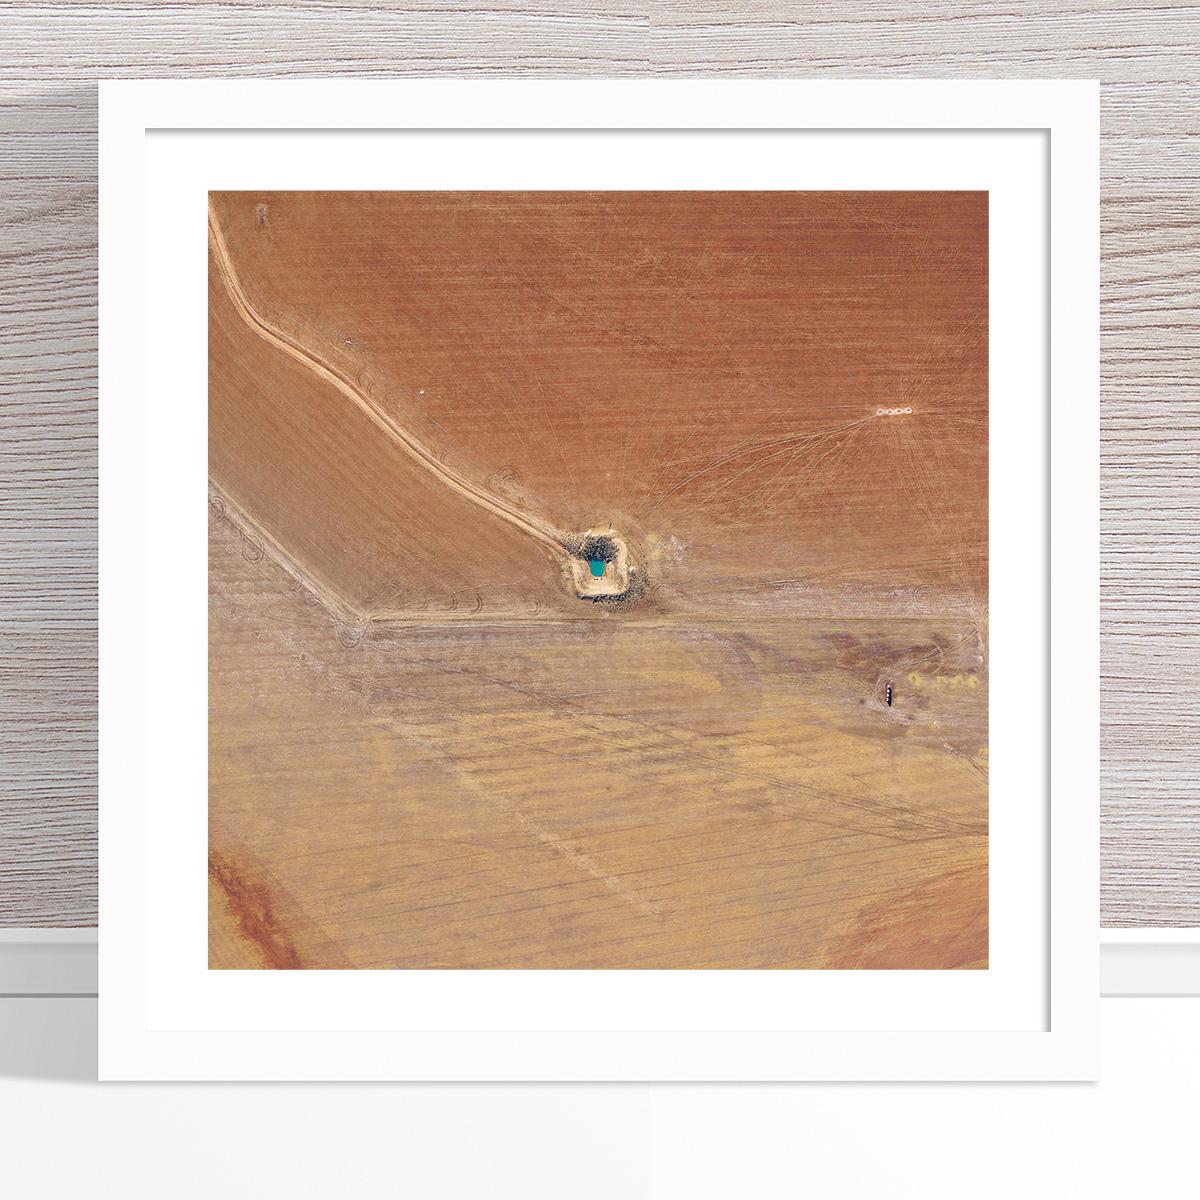 Chris Saunders - 'Aerial Outback 013' White Frame